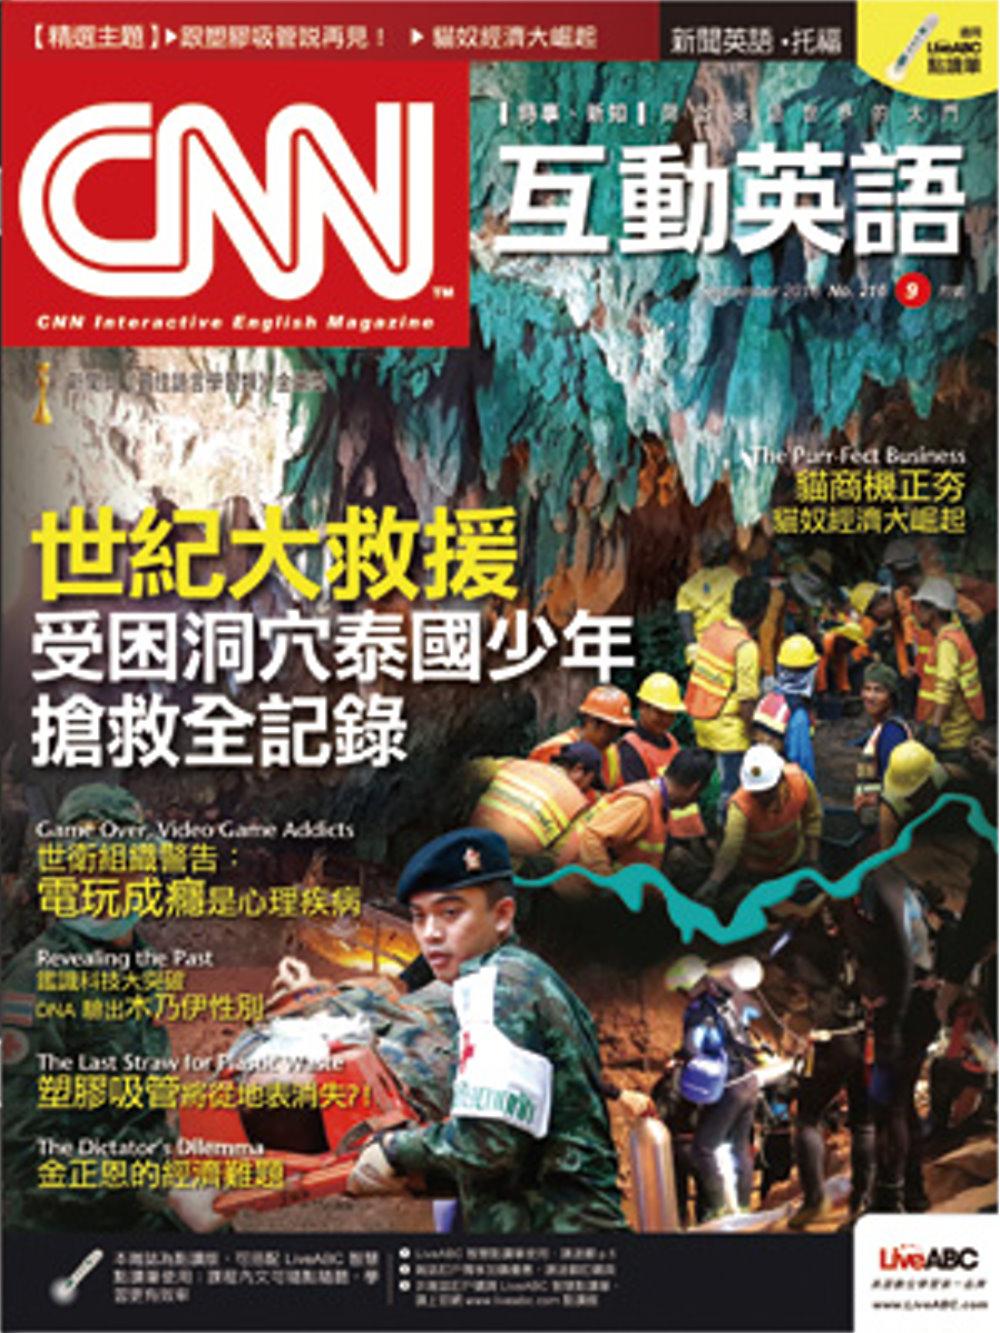 CNN互動英語(互動光碟版)一年12期+LiveABC智慧點讀筆+3期+TLC互動英語-海外旅遊篇 (點讀版)